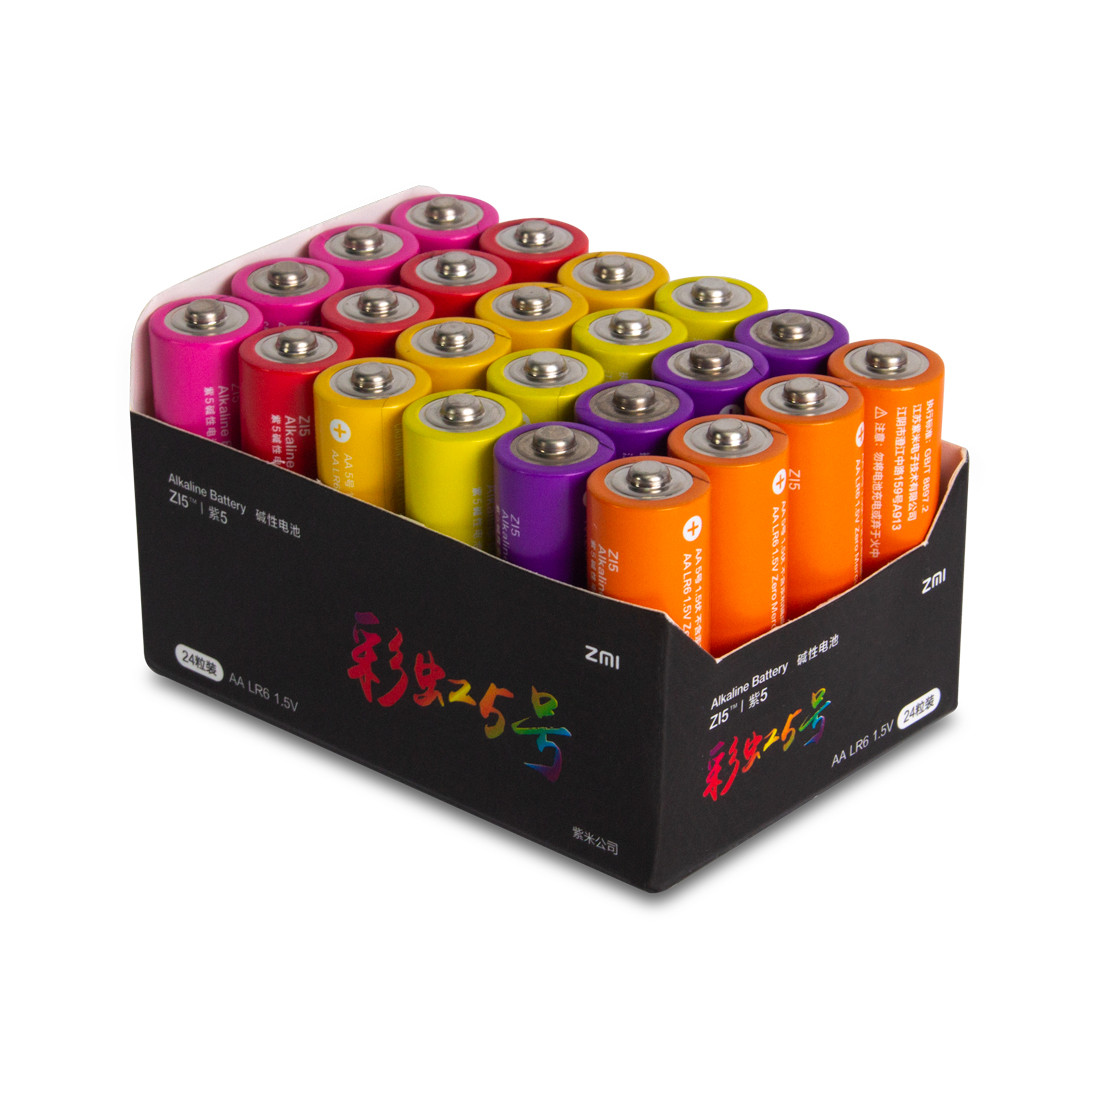 Батарейки Xiaomi ZMI AA524 ZI5 Rainbow 5 AA 24 шт в упаковке